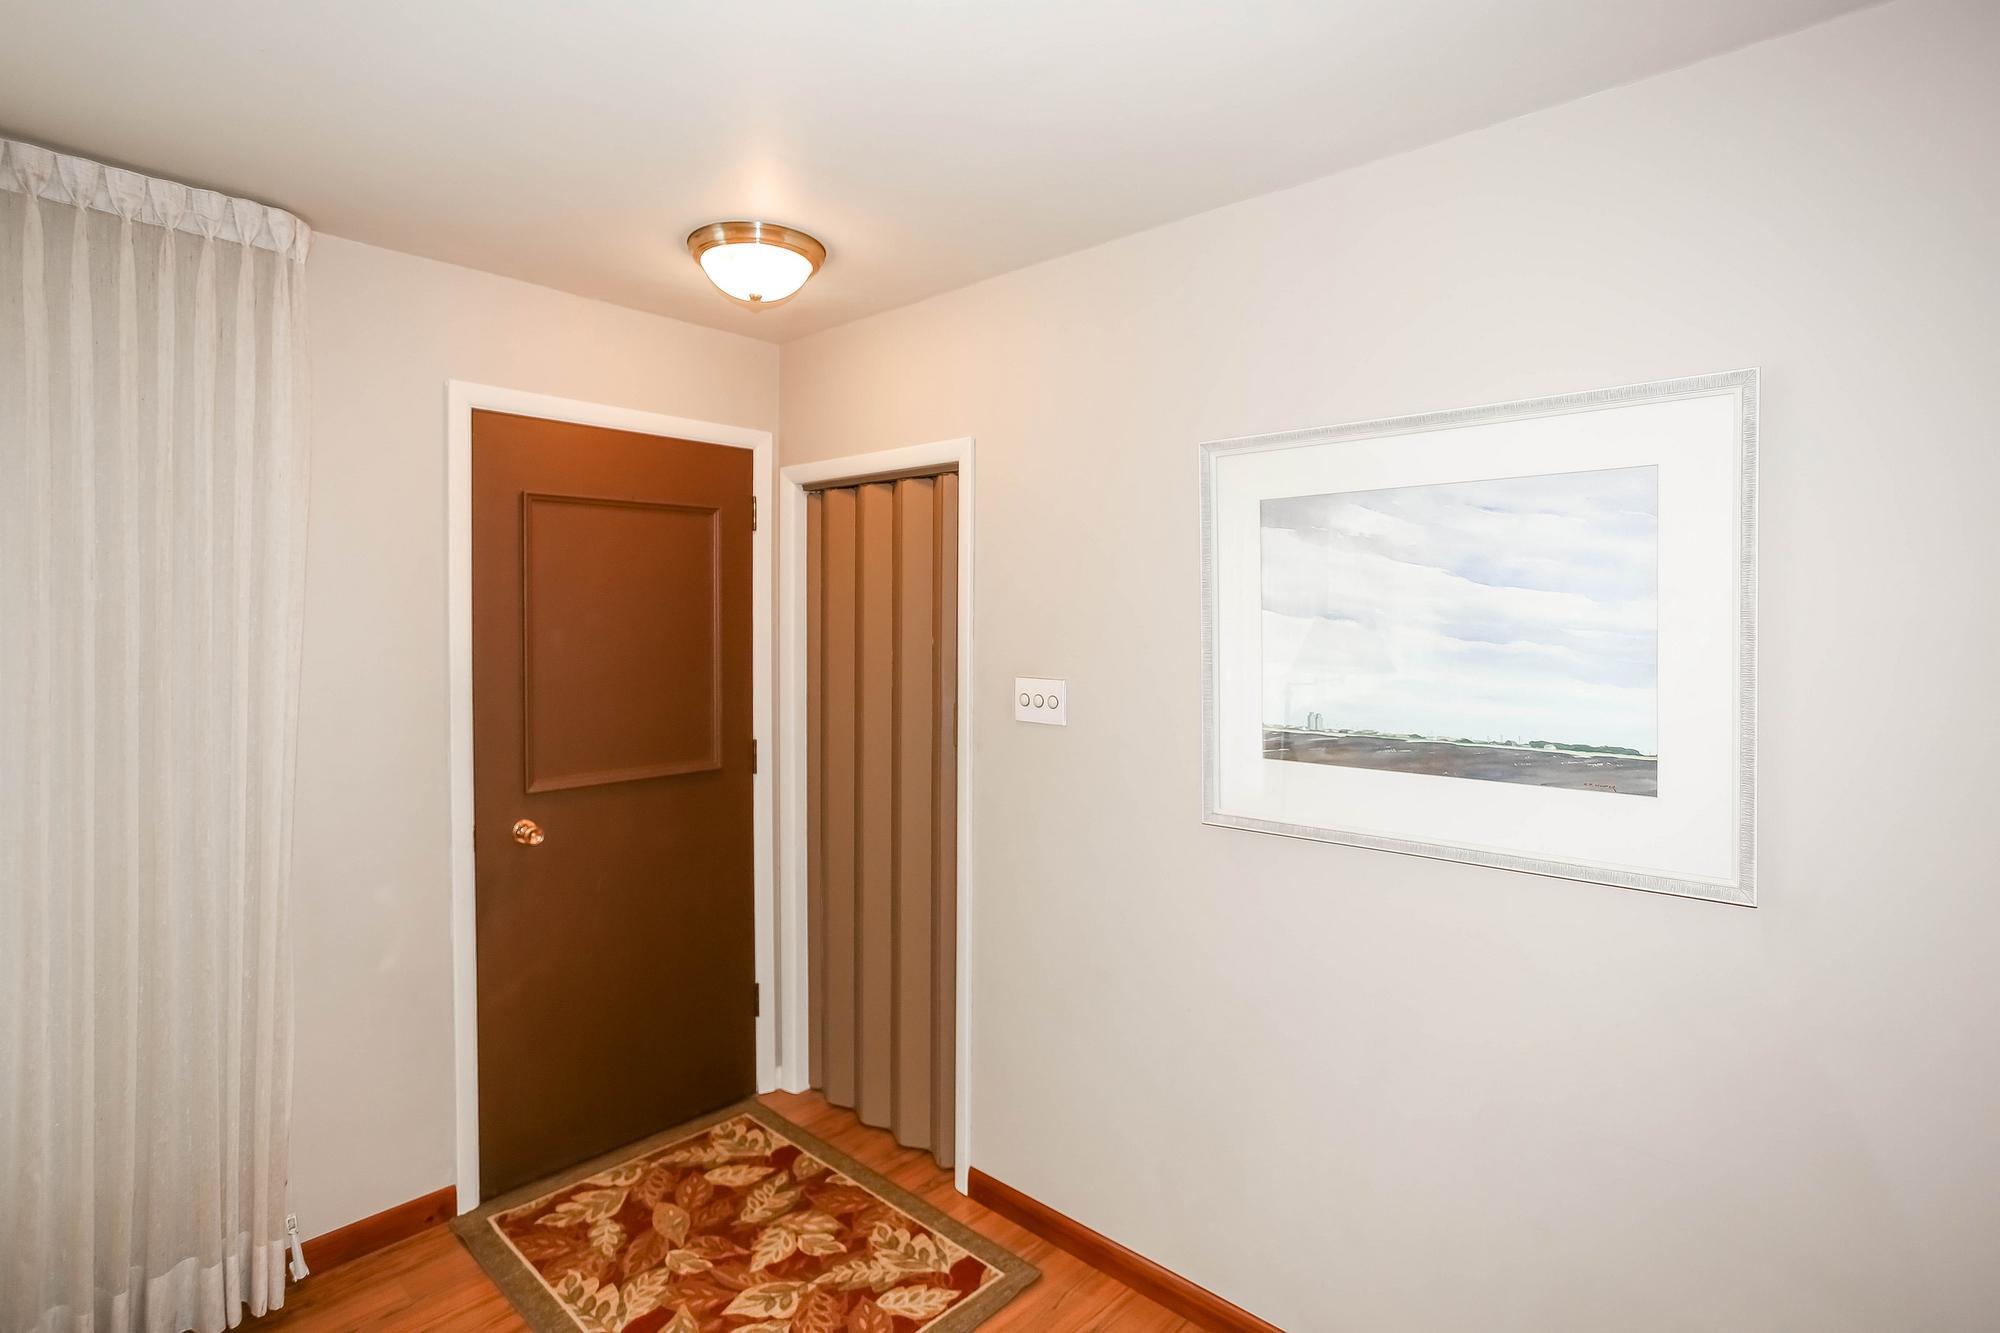 770 Haney Street, Winnipeg, Manitoba  R3R 0Y8 - Photo 1 - 202011226